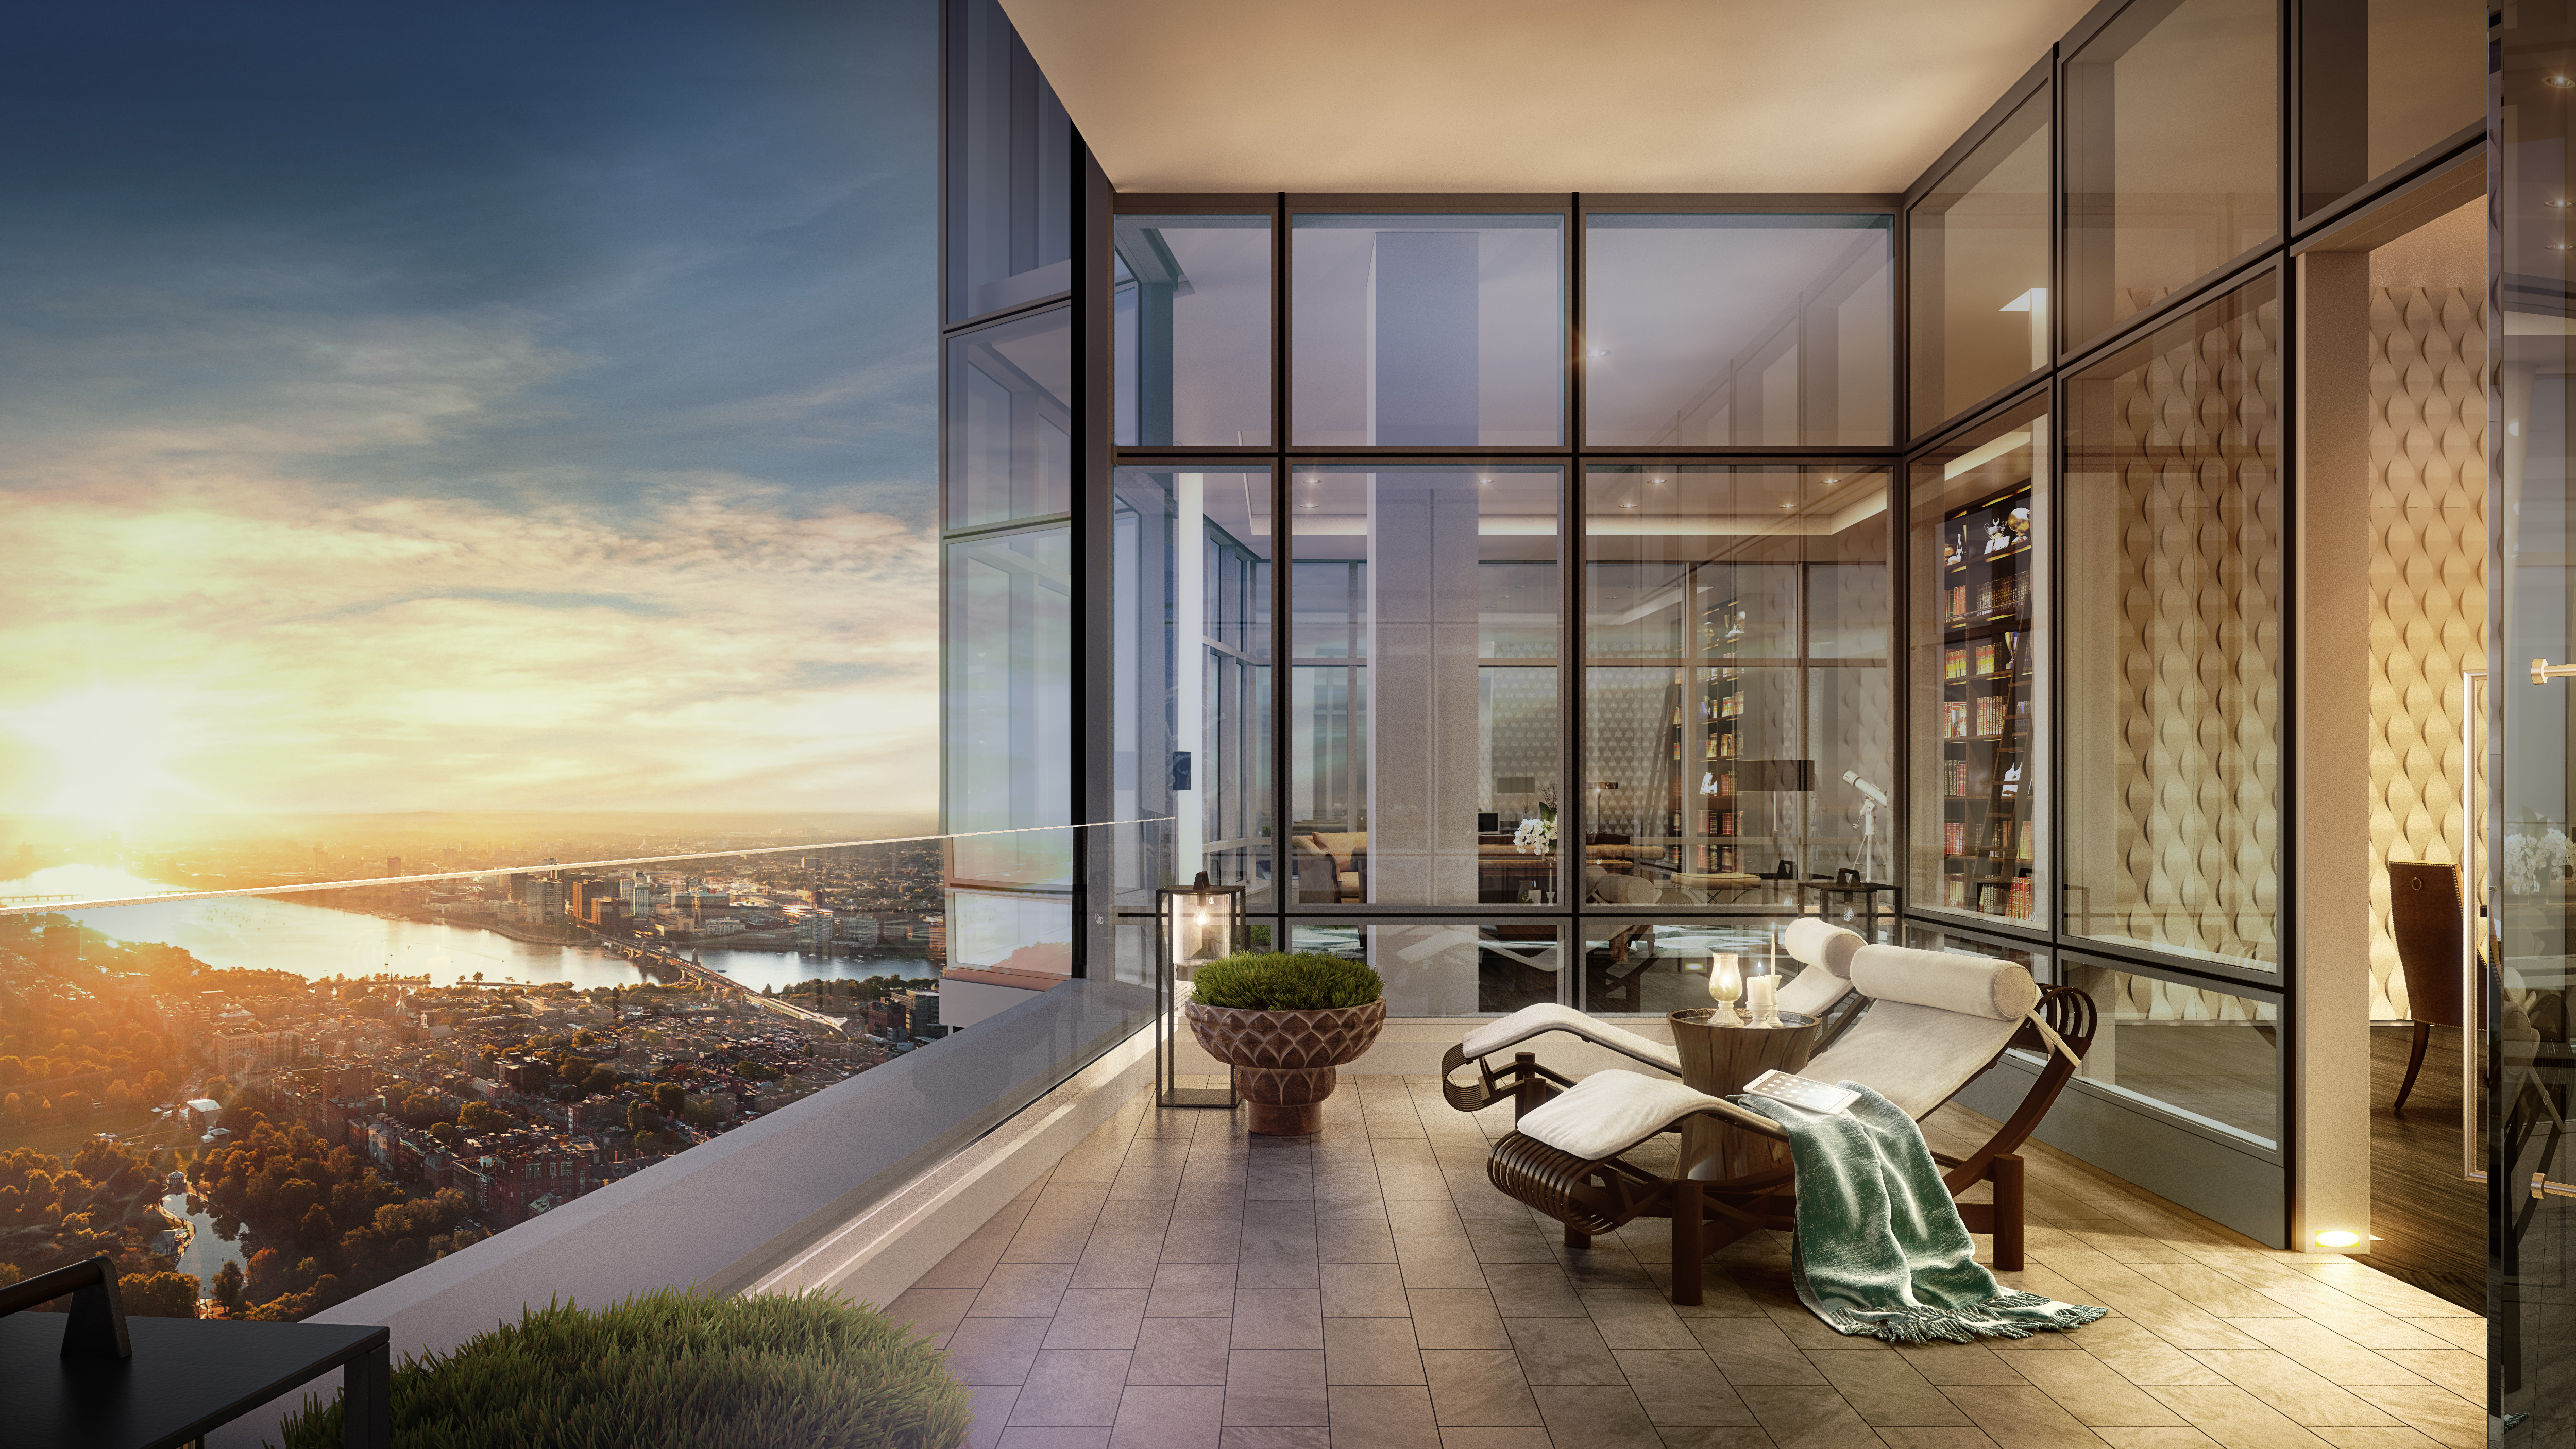 The lowdown on 5 condo towers coming to Boston - The Boston